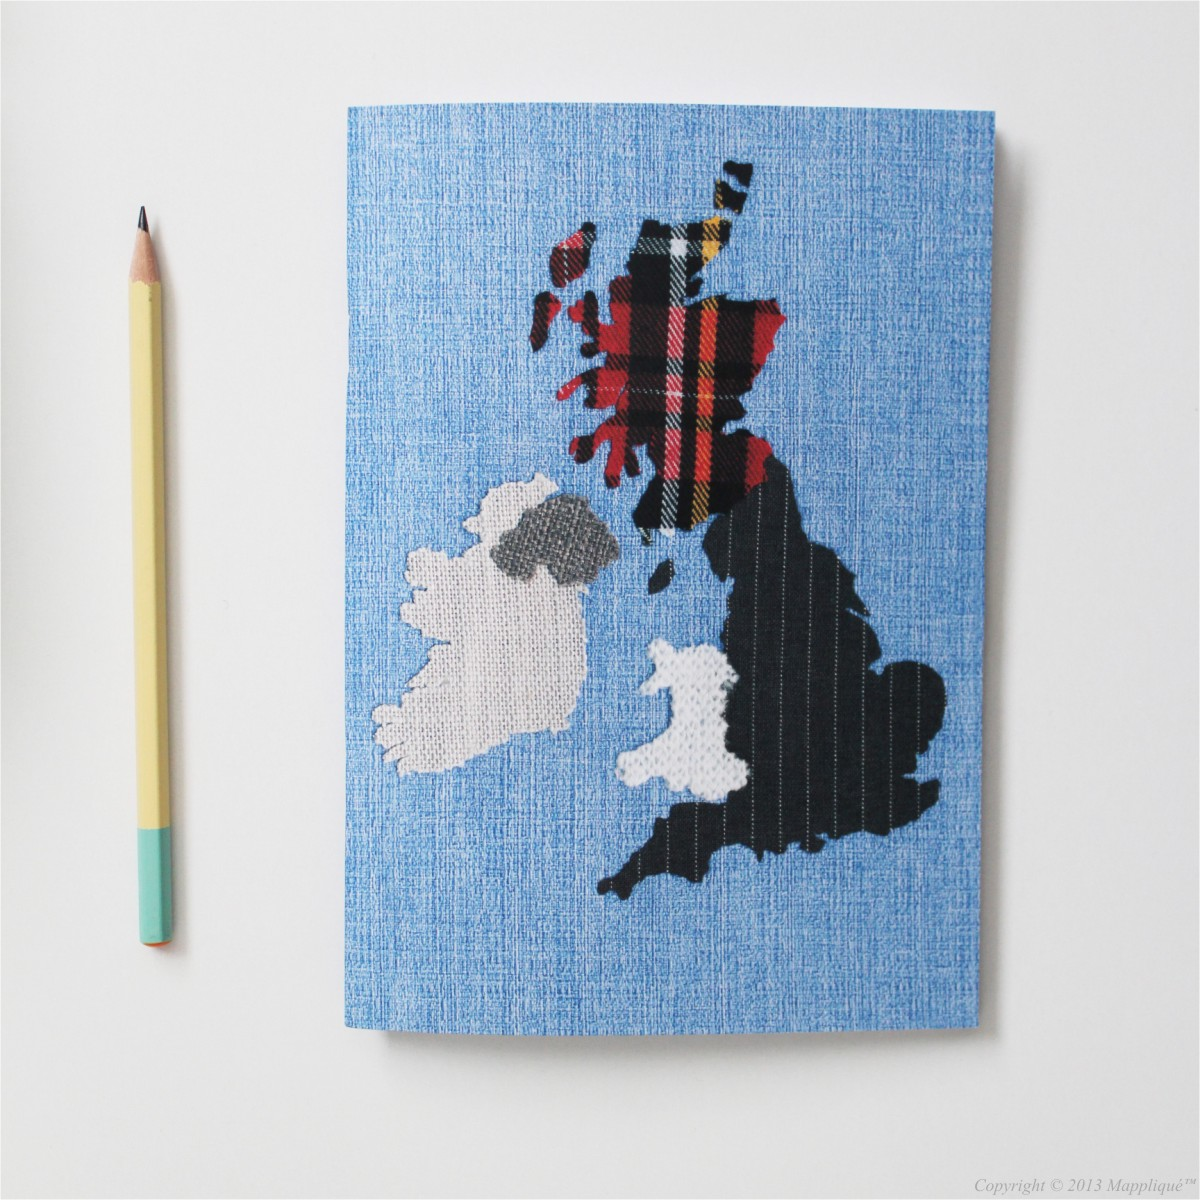 Mappliqué A5 British Isles Notebook